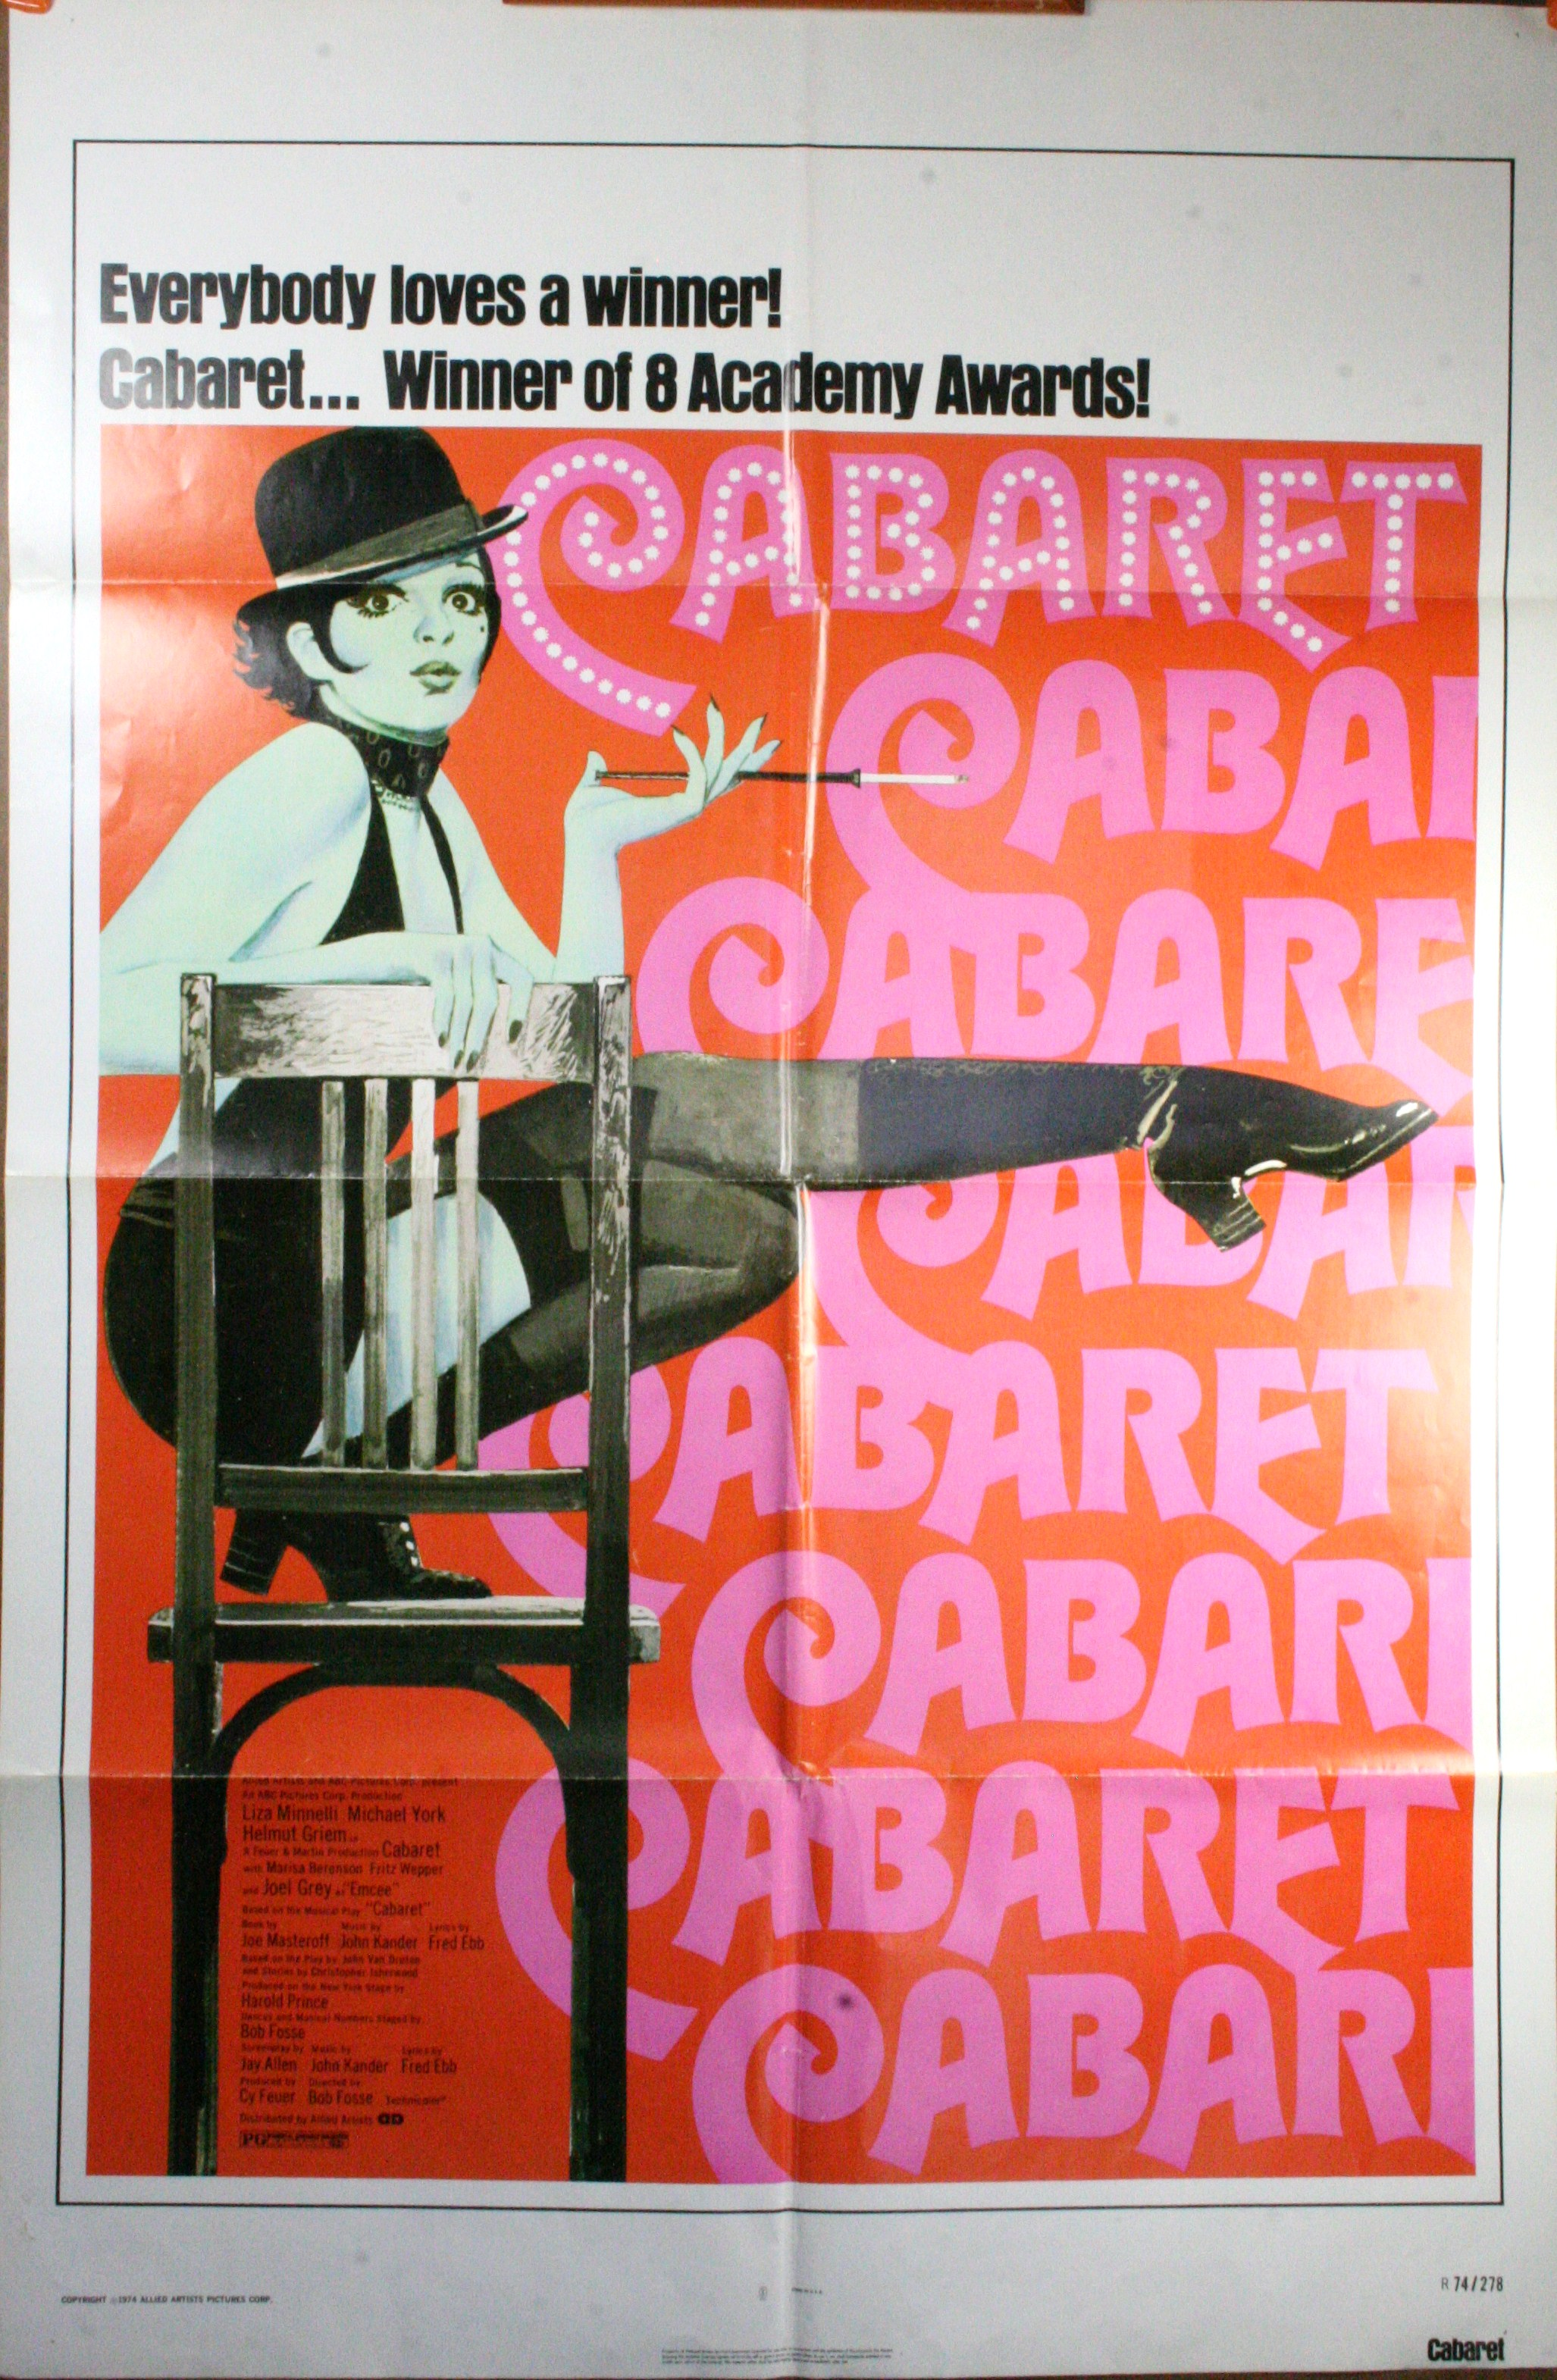 CABARET Liza Minelli Musical Poster